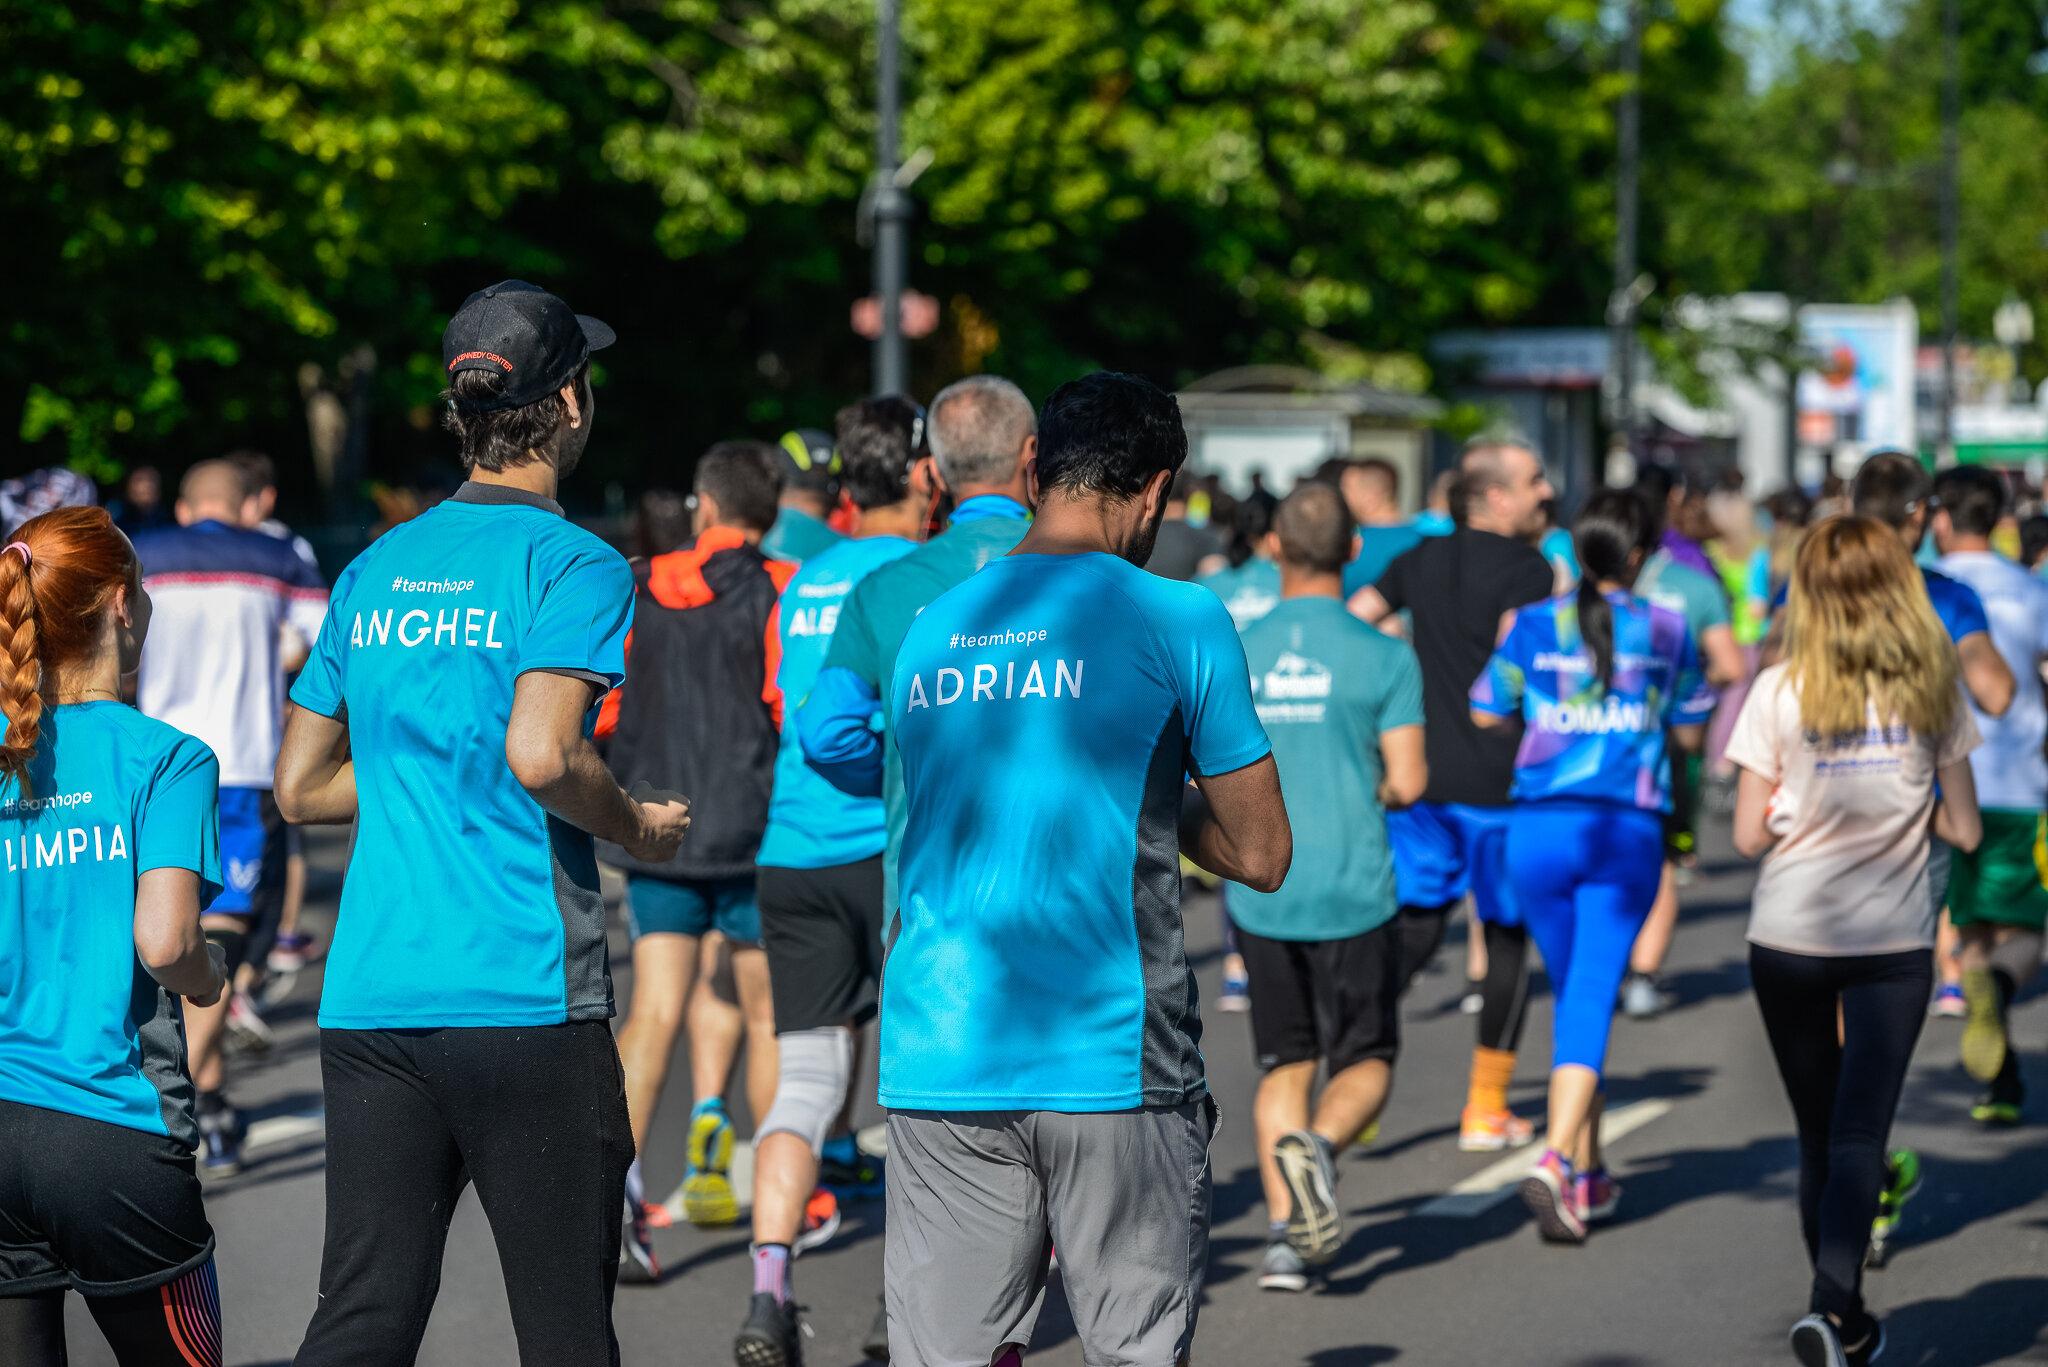 Adrian Nartea_Anghel Damian_Semimaratonul Bucuresti_Foto Radu Fugarescu.jpg